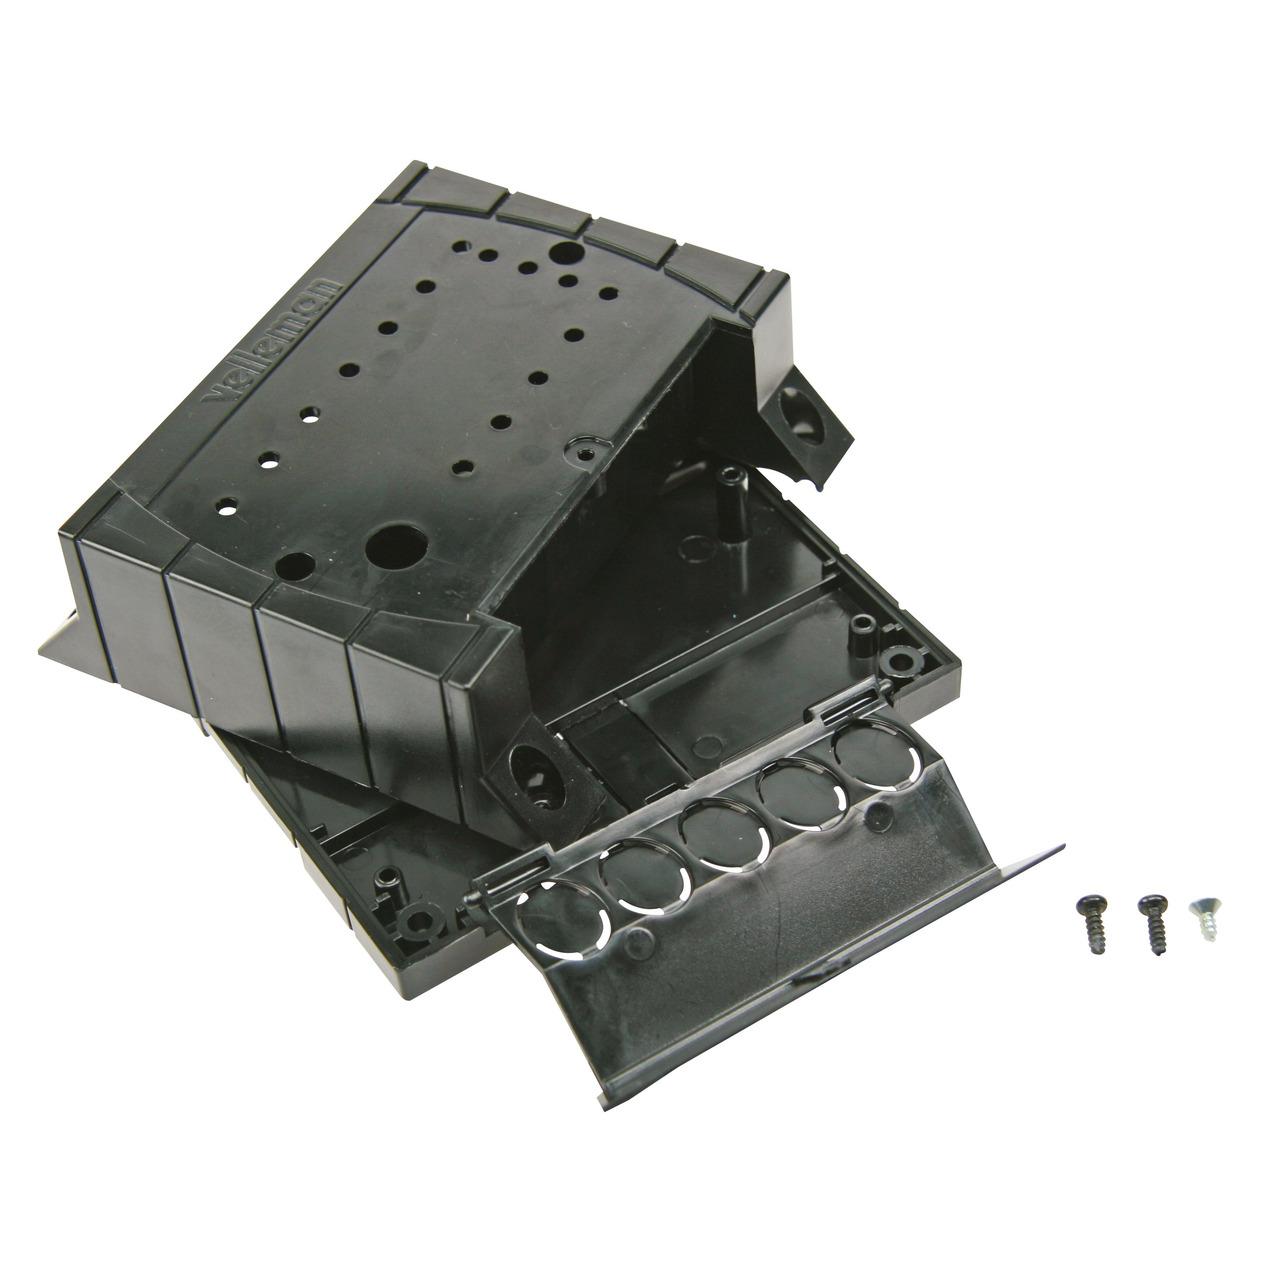 Velleman Gehund-228 use VPB108- 110 x 100 x 45 mm